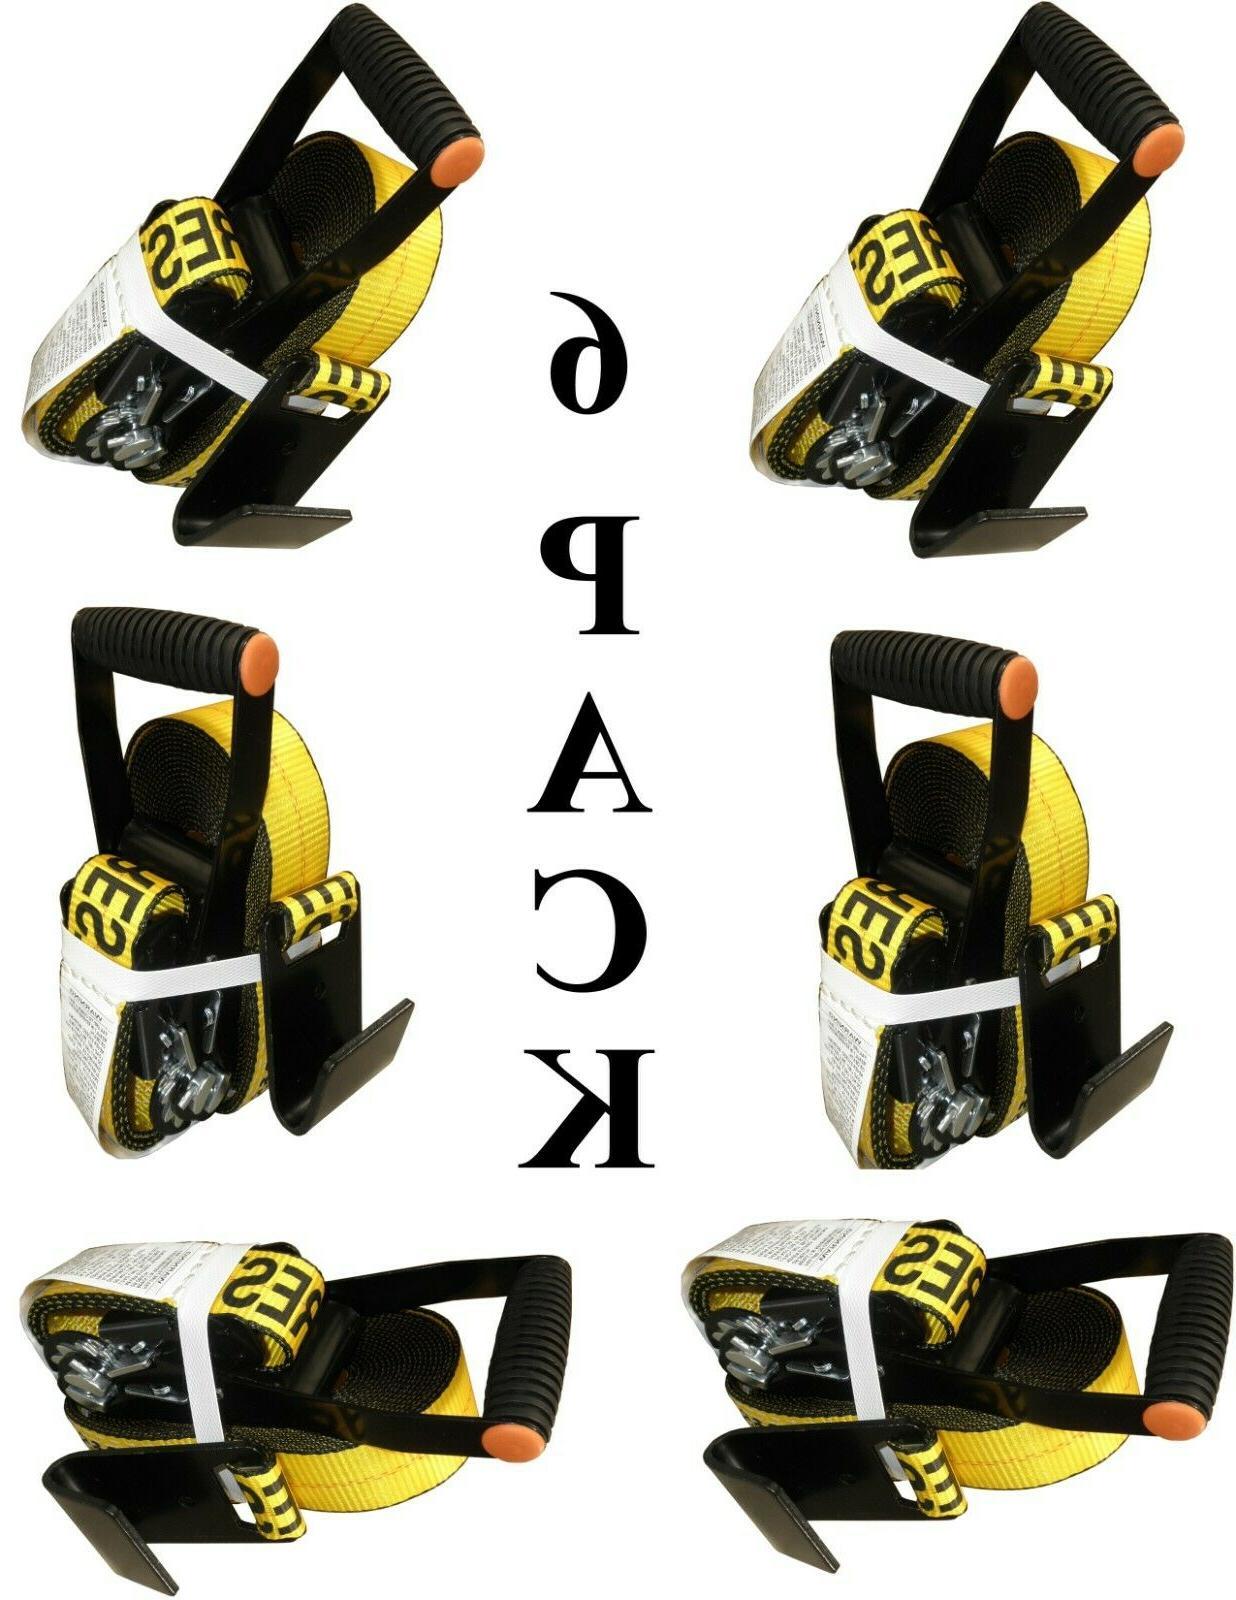 6x ratchets heavy duty tie down straps